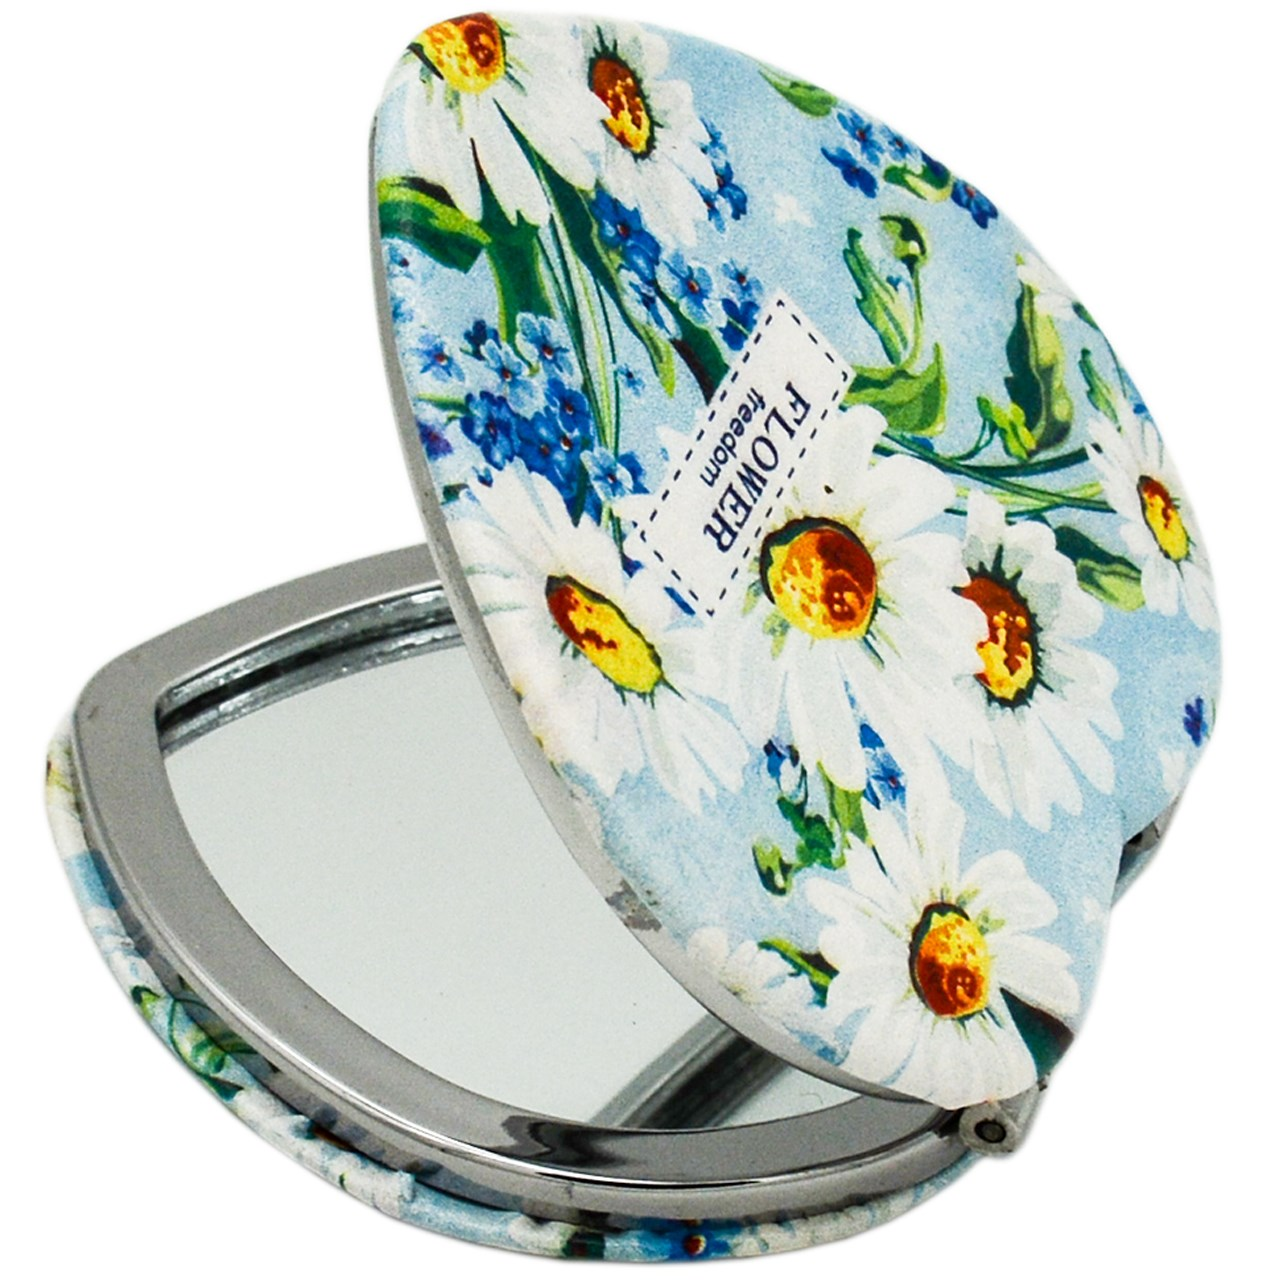 قیمت آینه جیبی کد 5006